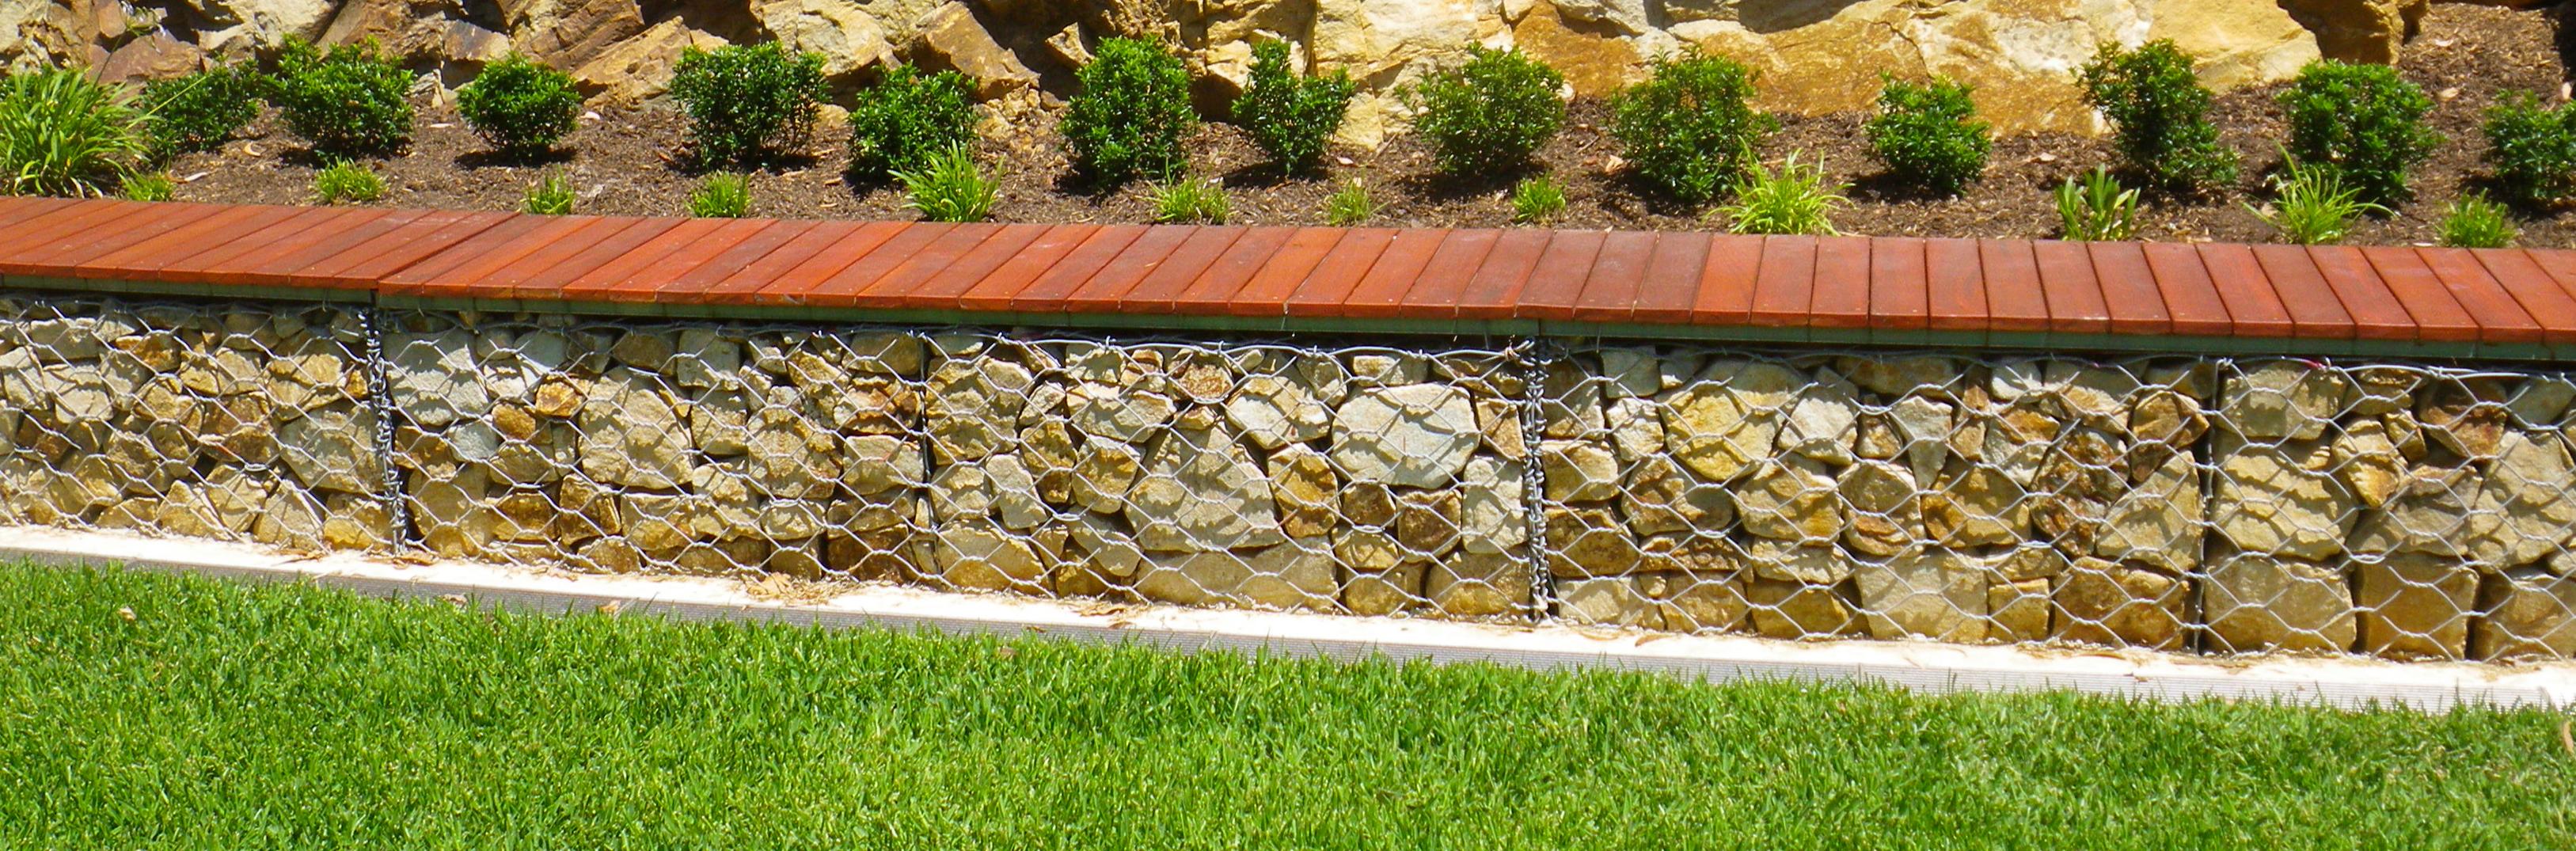 12 gabion landscaping ideas for spring prospect for Gabion landscaping